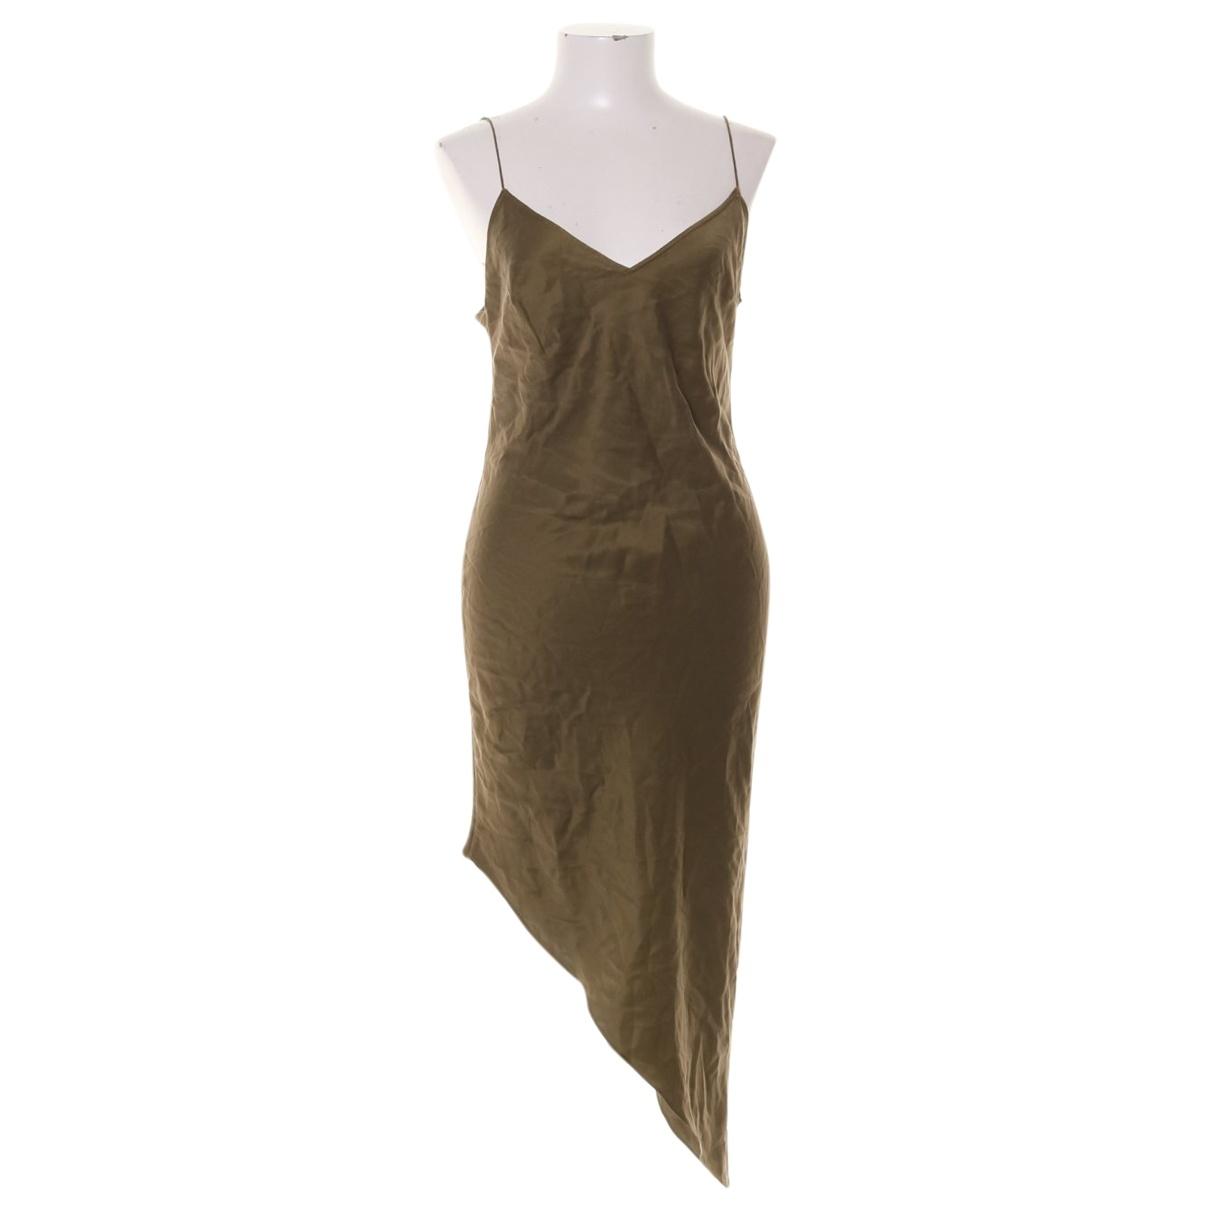 H&m Studio \N Khaki Silk dress for Women 34 FR